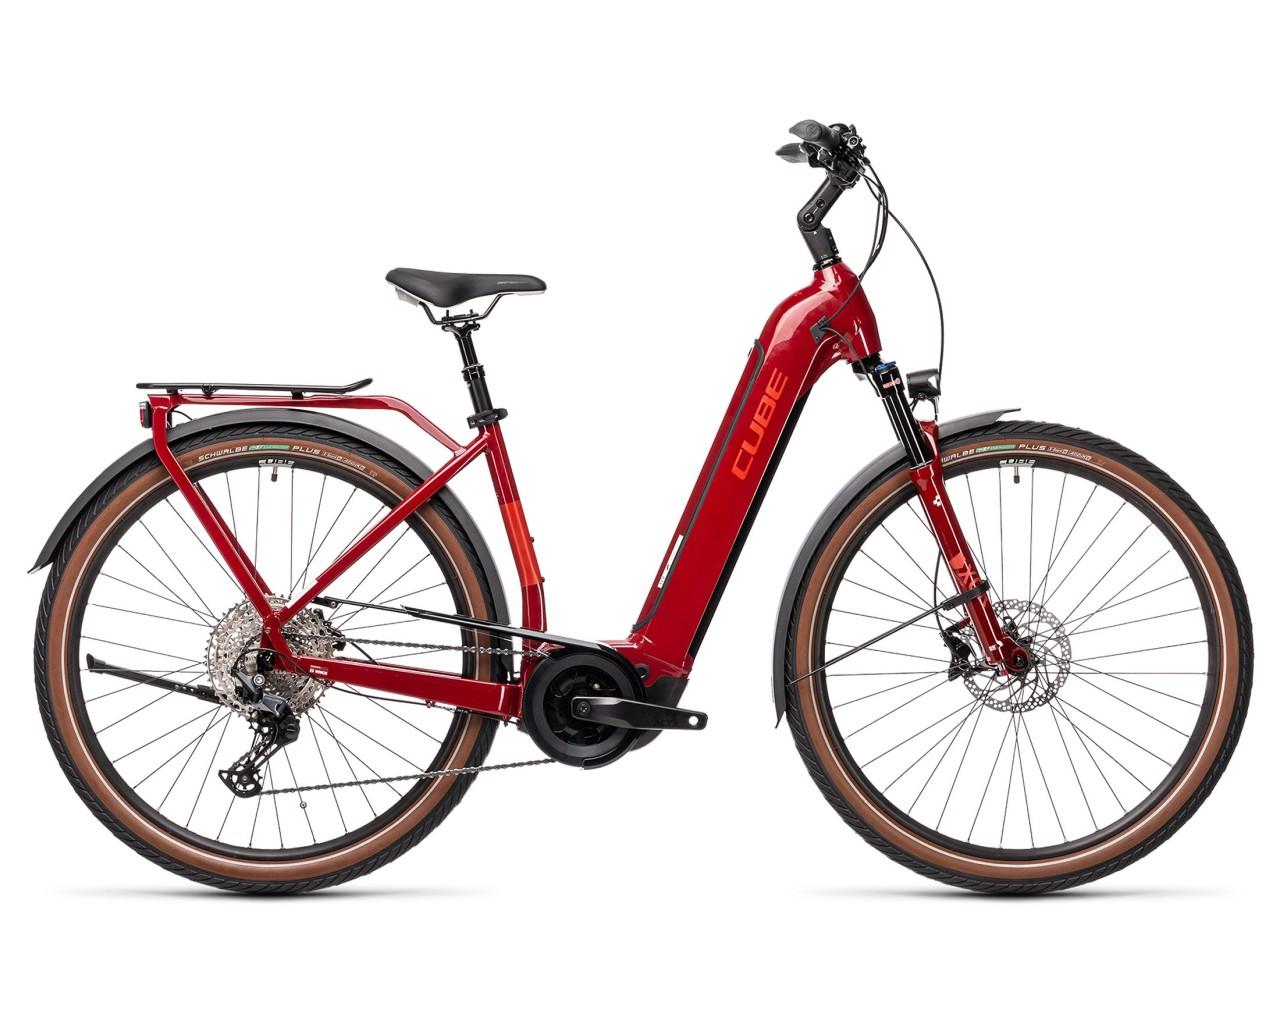 Cube Touring Hybrid EXC 500 29 Easy Entry - Pedelec Trekking Bike 2021 | red n grey